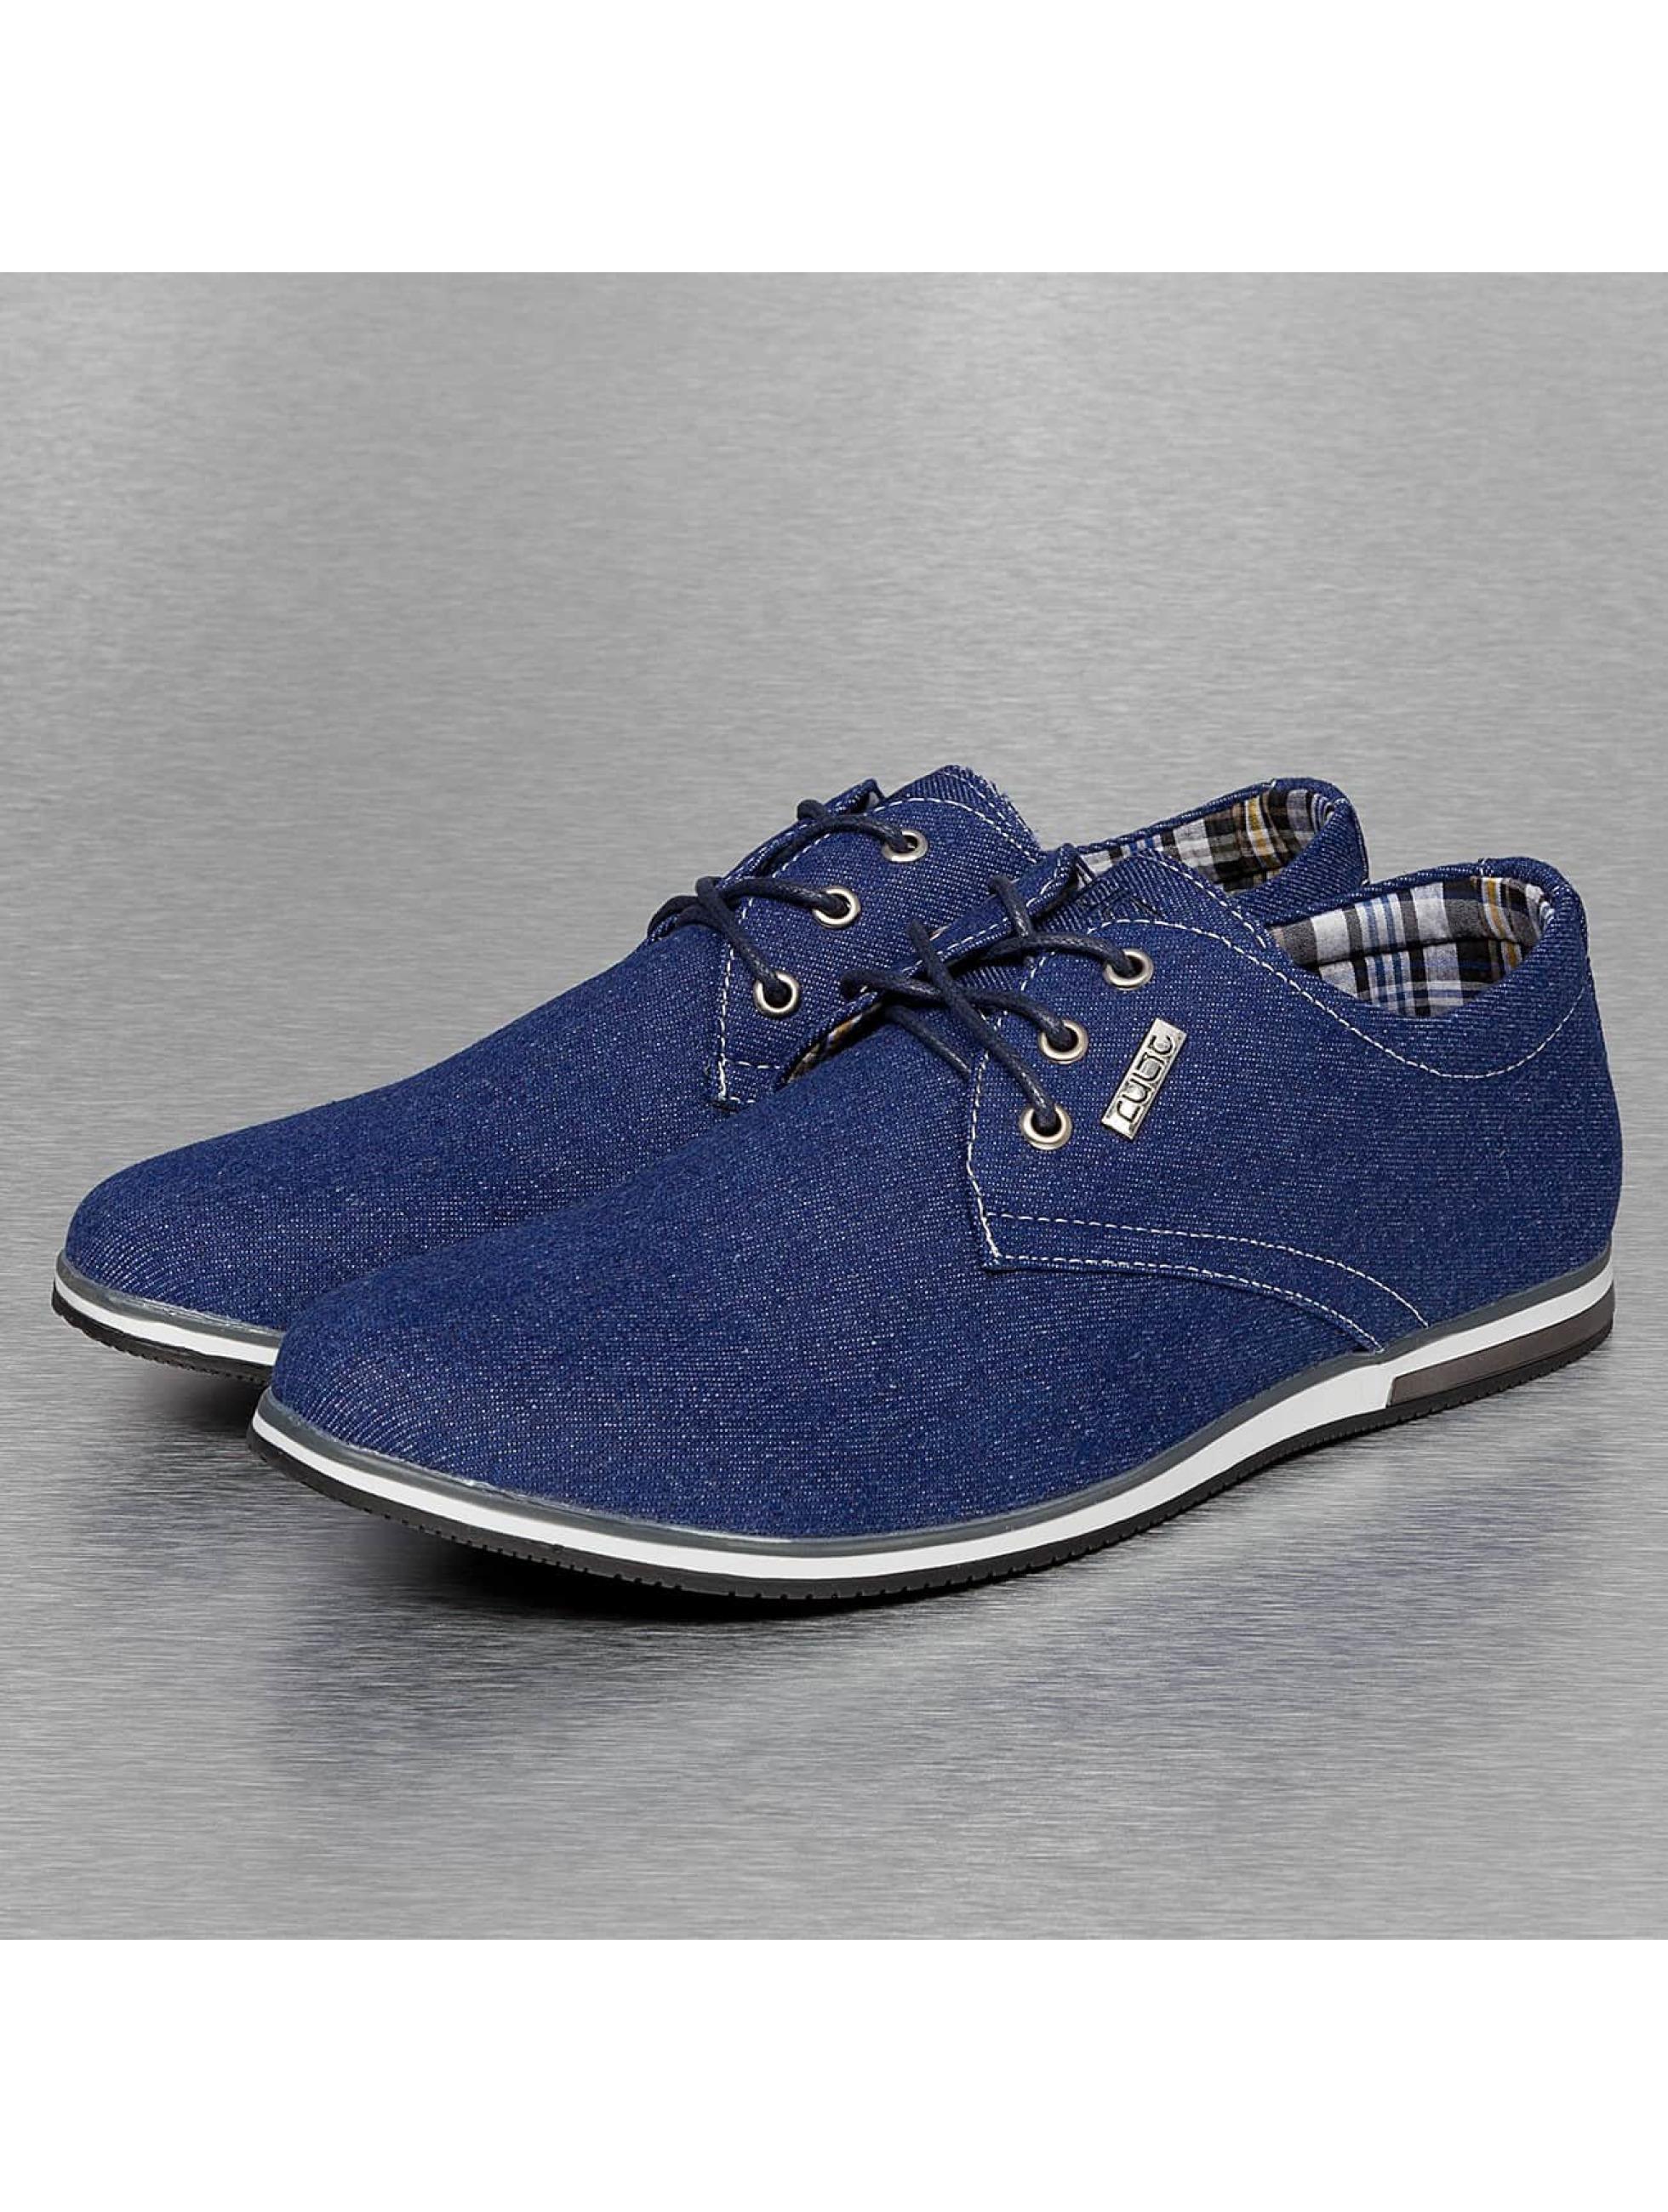 New York Style Sneaker Galway Denim blu